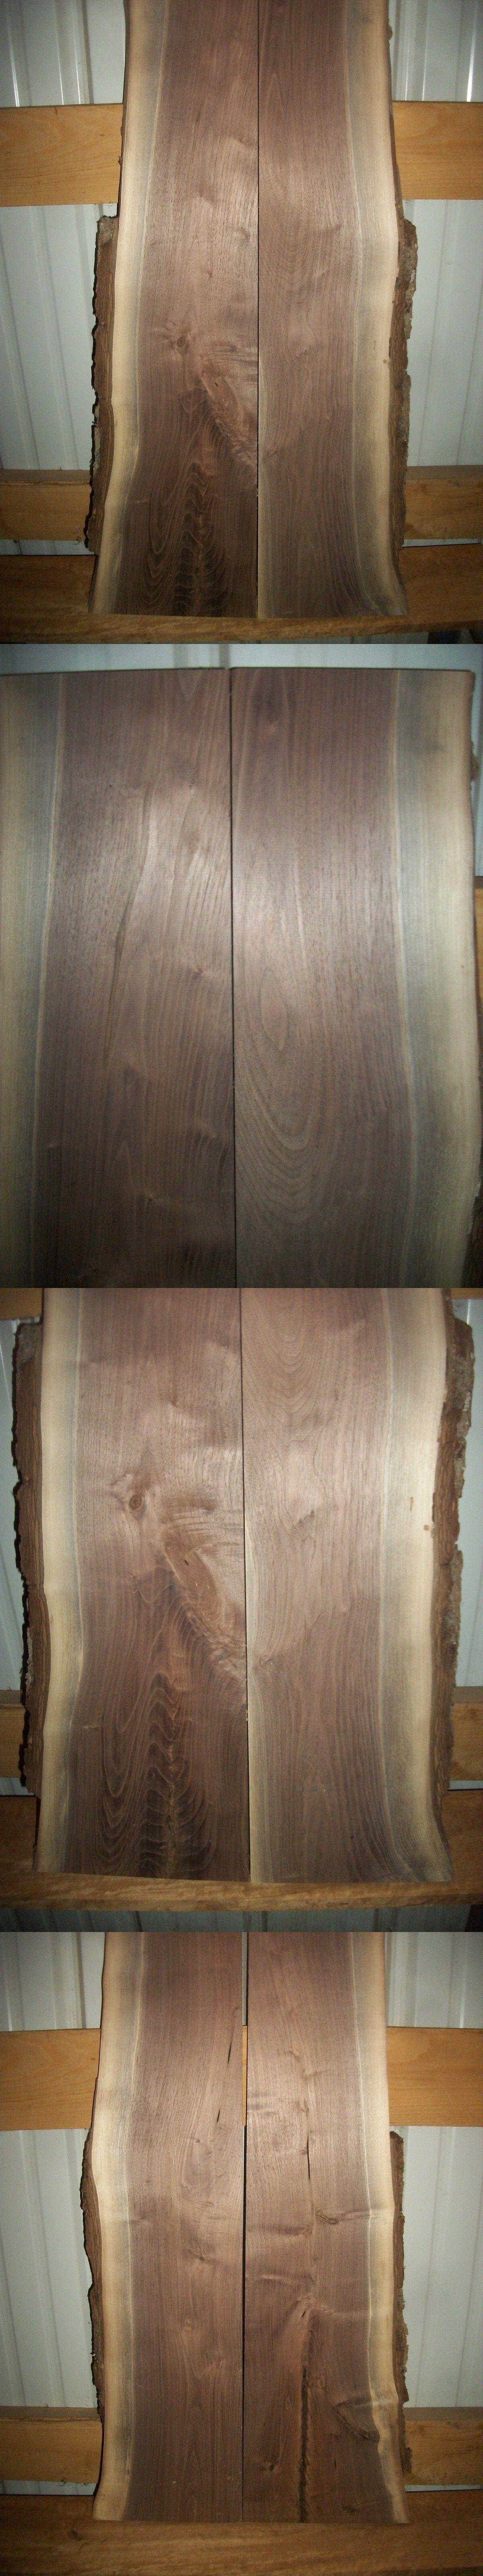 Woodworking Lumber 84011 2 Pc Rustic Walnut Slab Air Dried 4 Years Wood 1